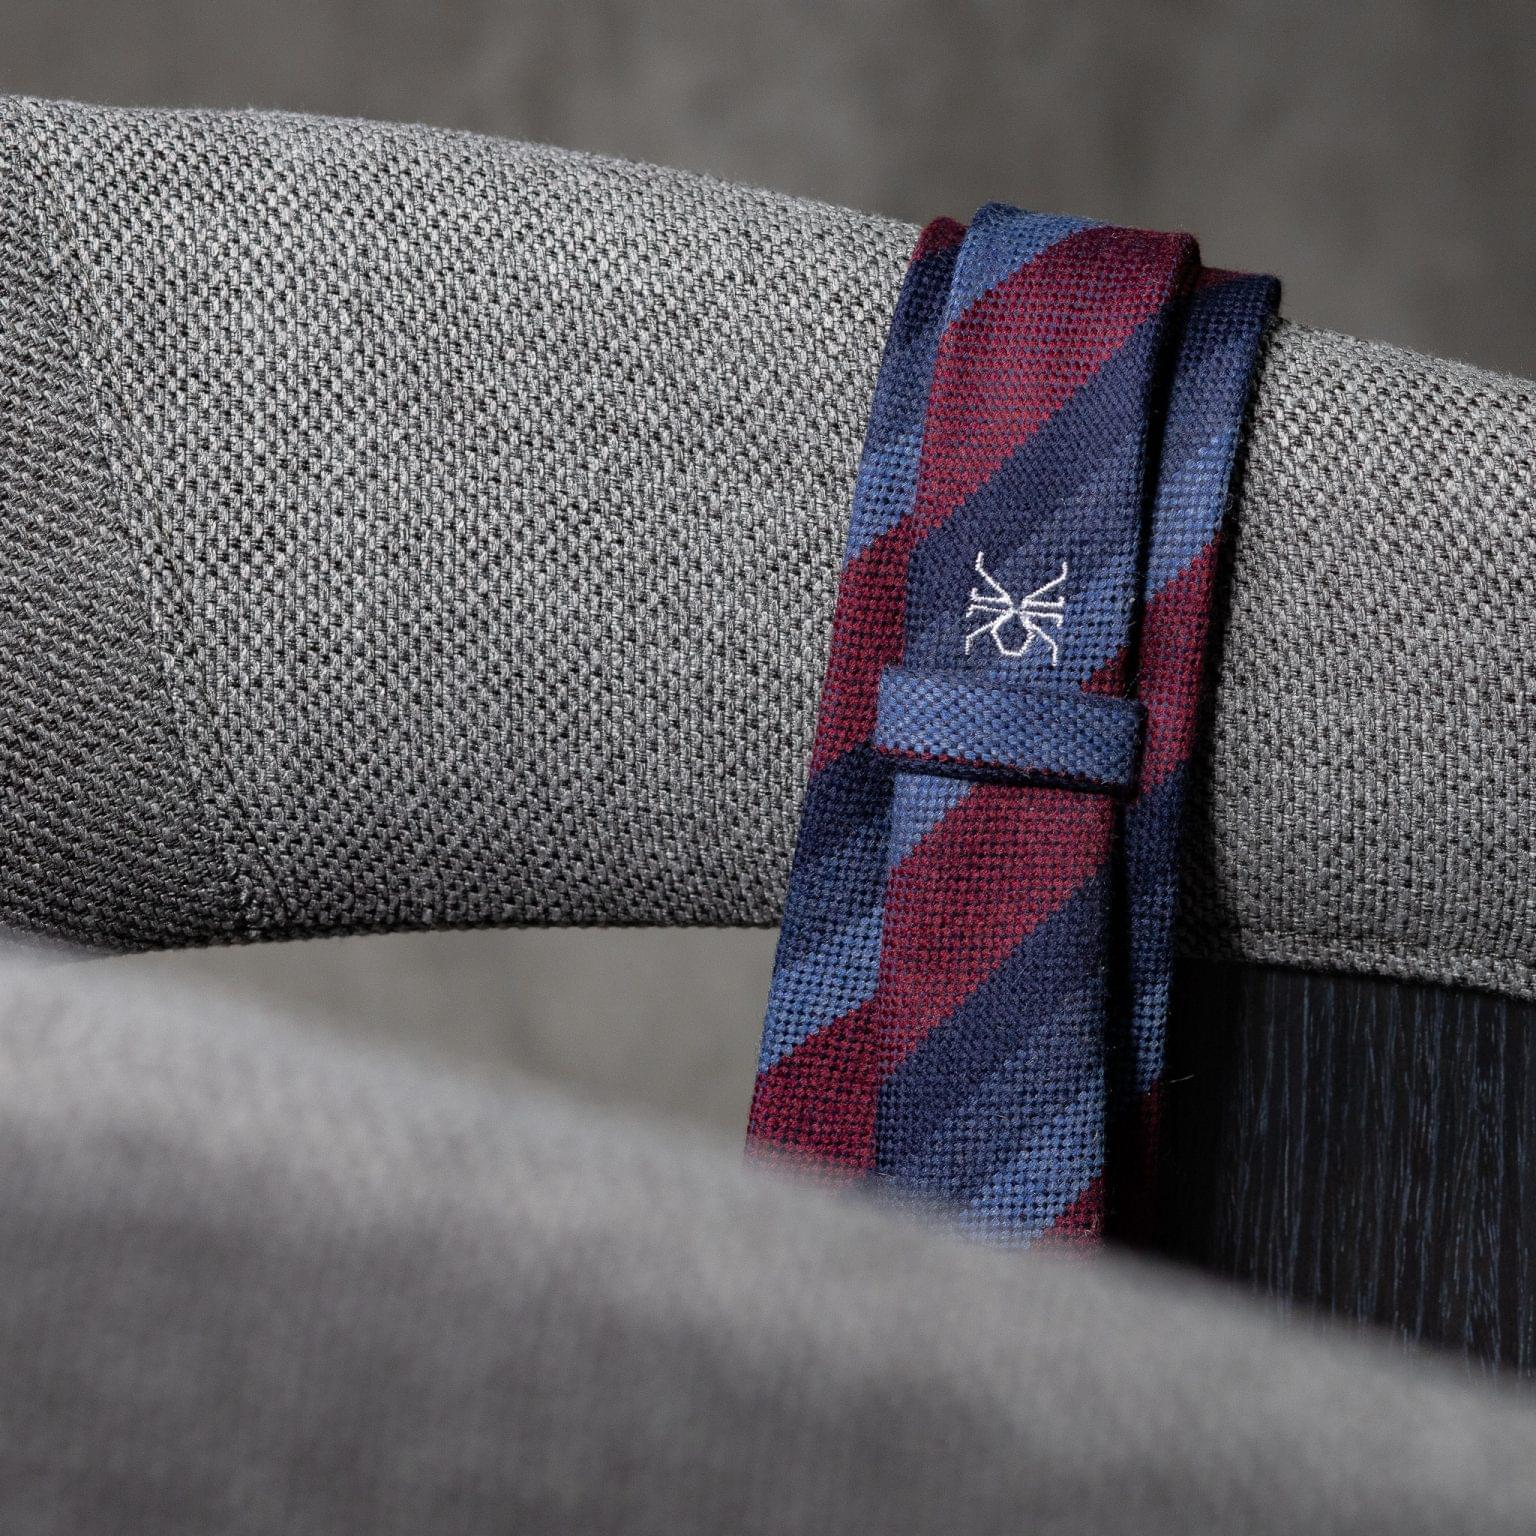 WOOL-LANA-0512-Tie-Initials-Corbata-Iniciales-The-Seelk-4